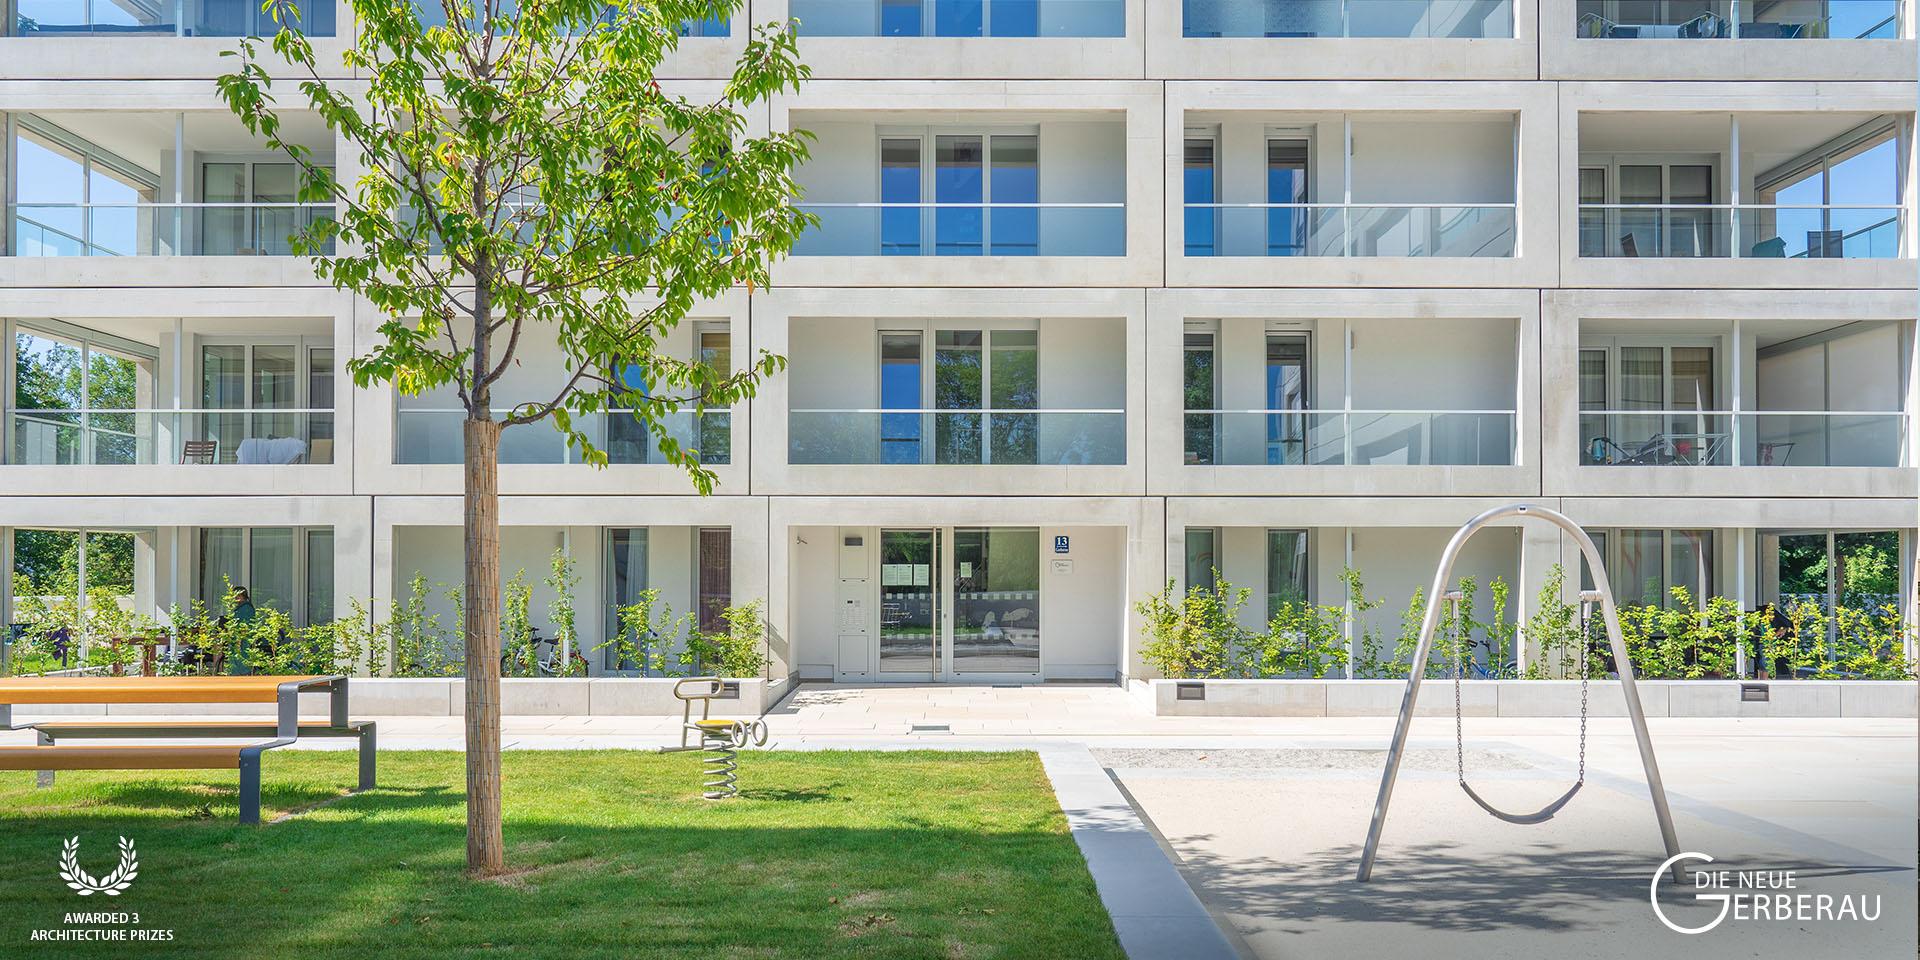 condominiums munich: Die neue Gerberau